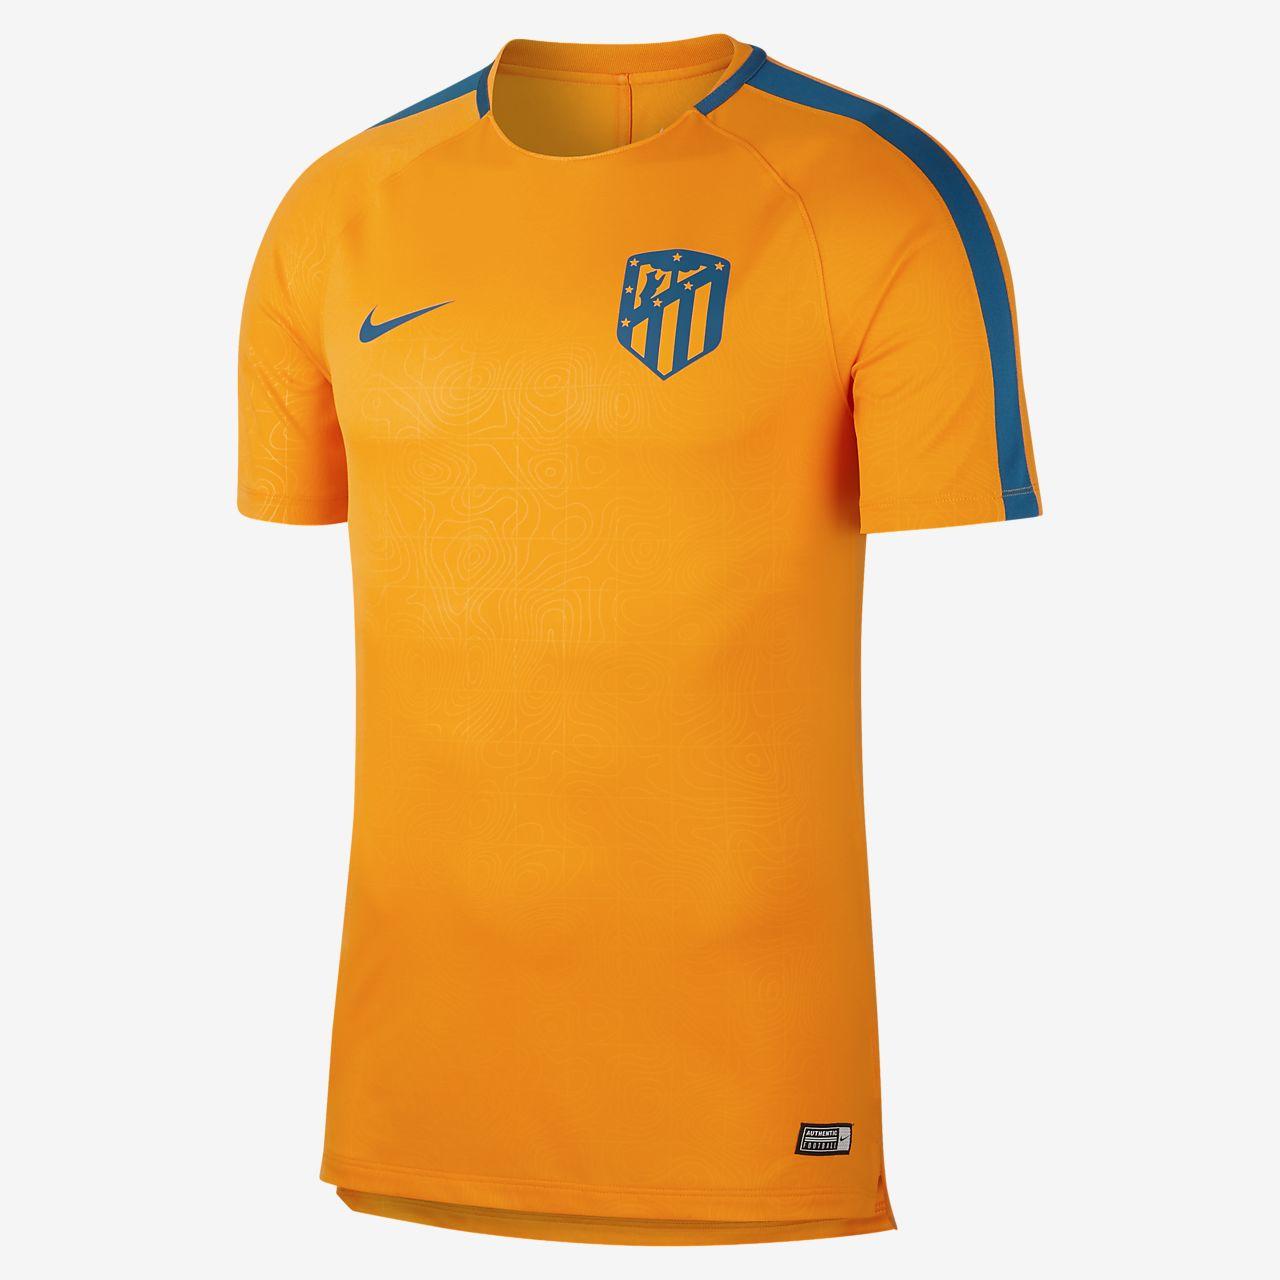 Prenda para la parte superior de fútbol de manga corta para hombre Nike Dri-FIT Atletico de Madrid Squad